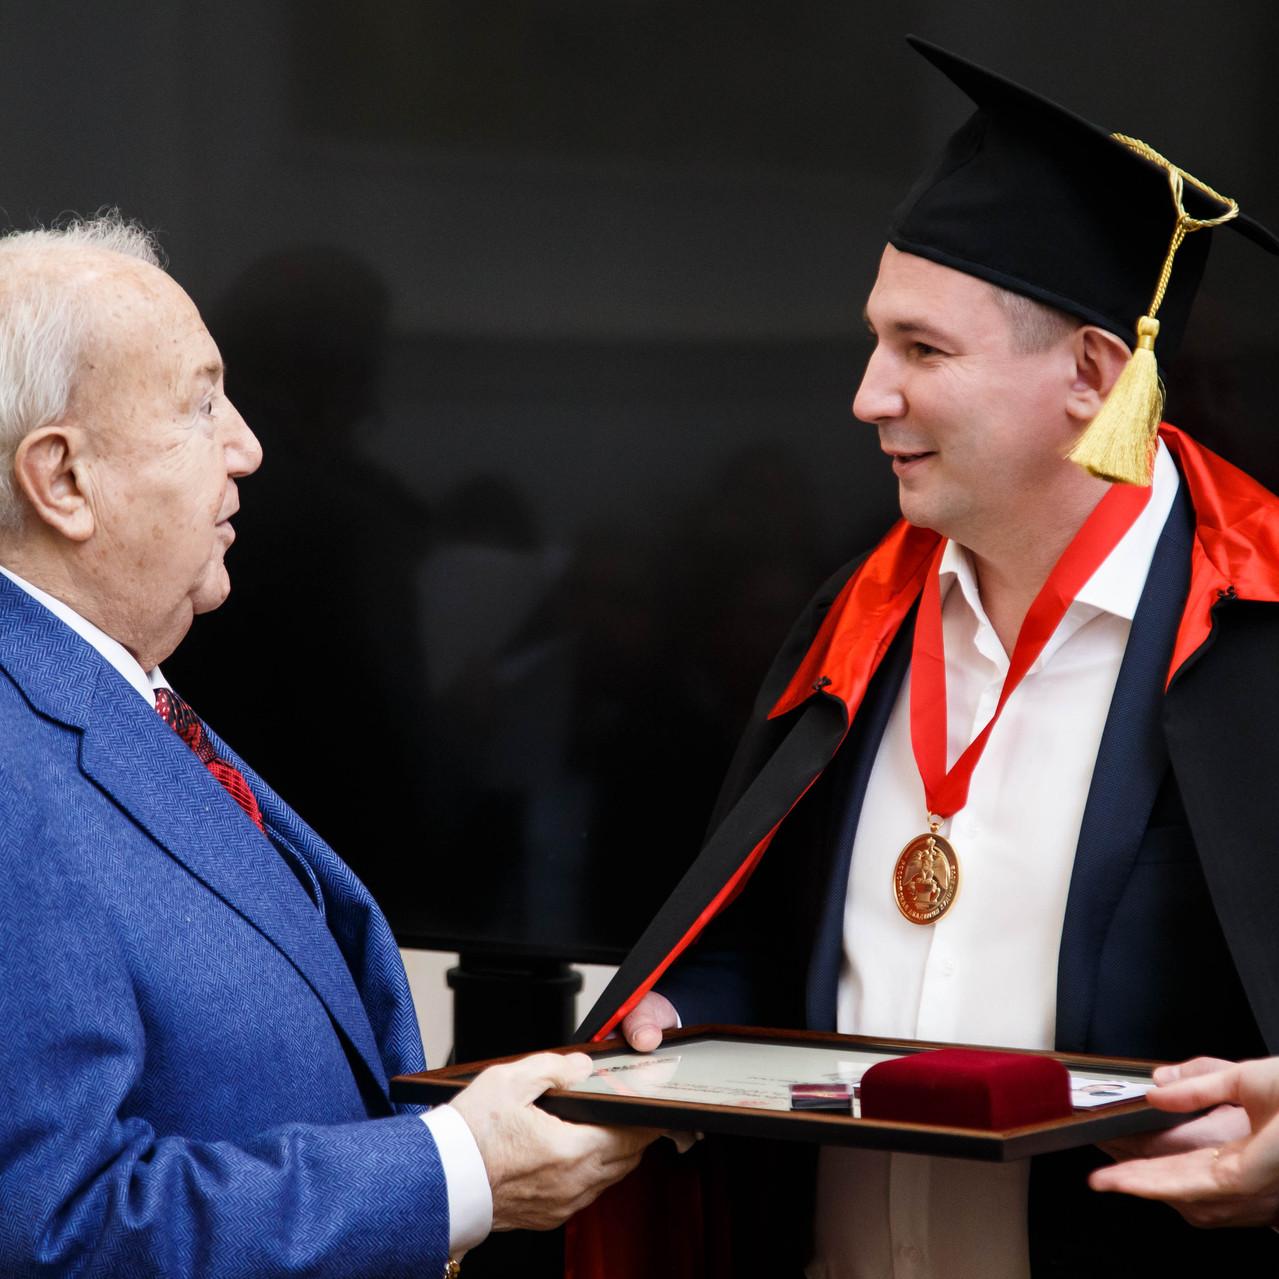 З.К. Церетели и Г.А. Гапонов